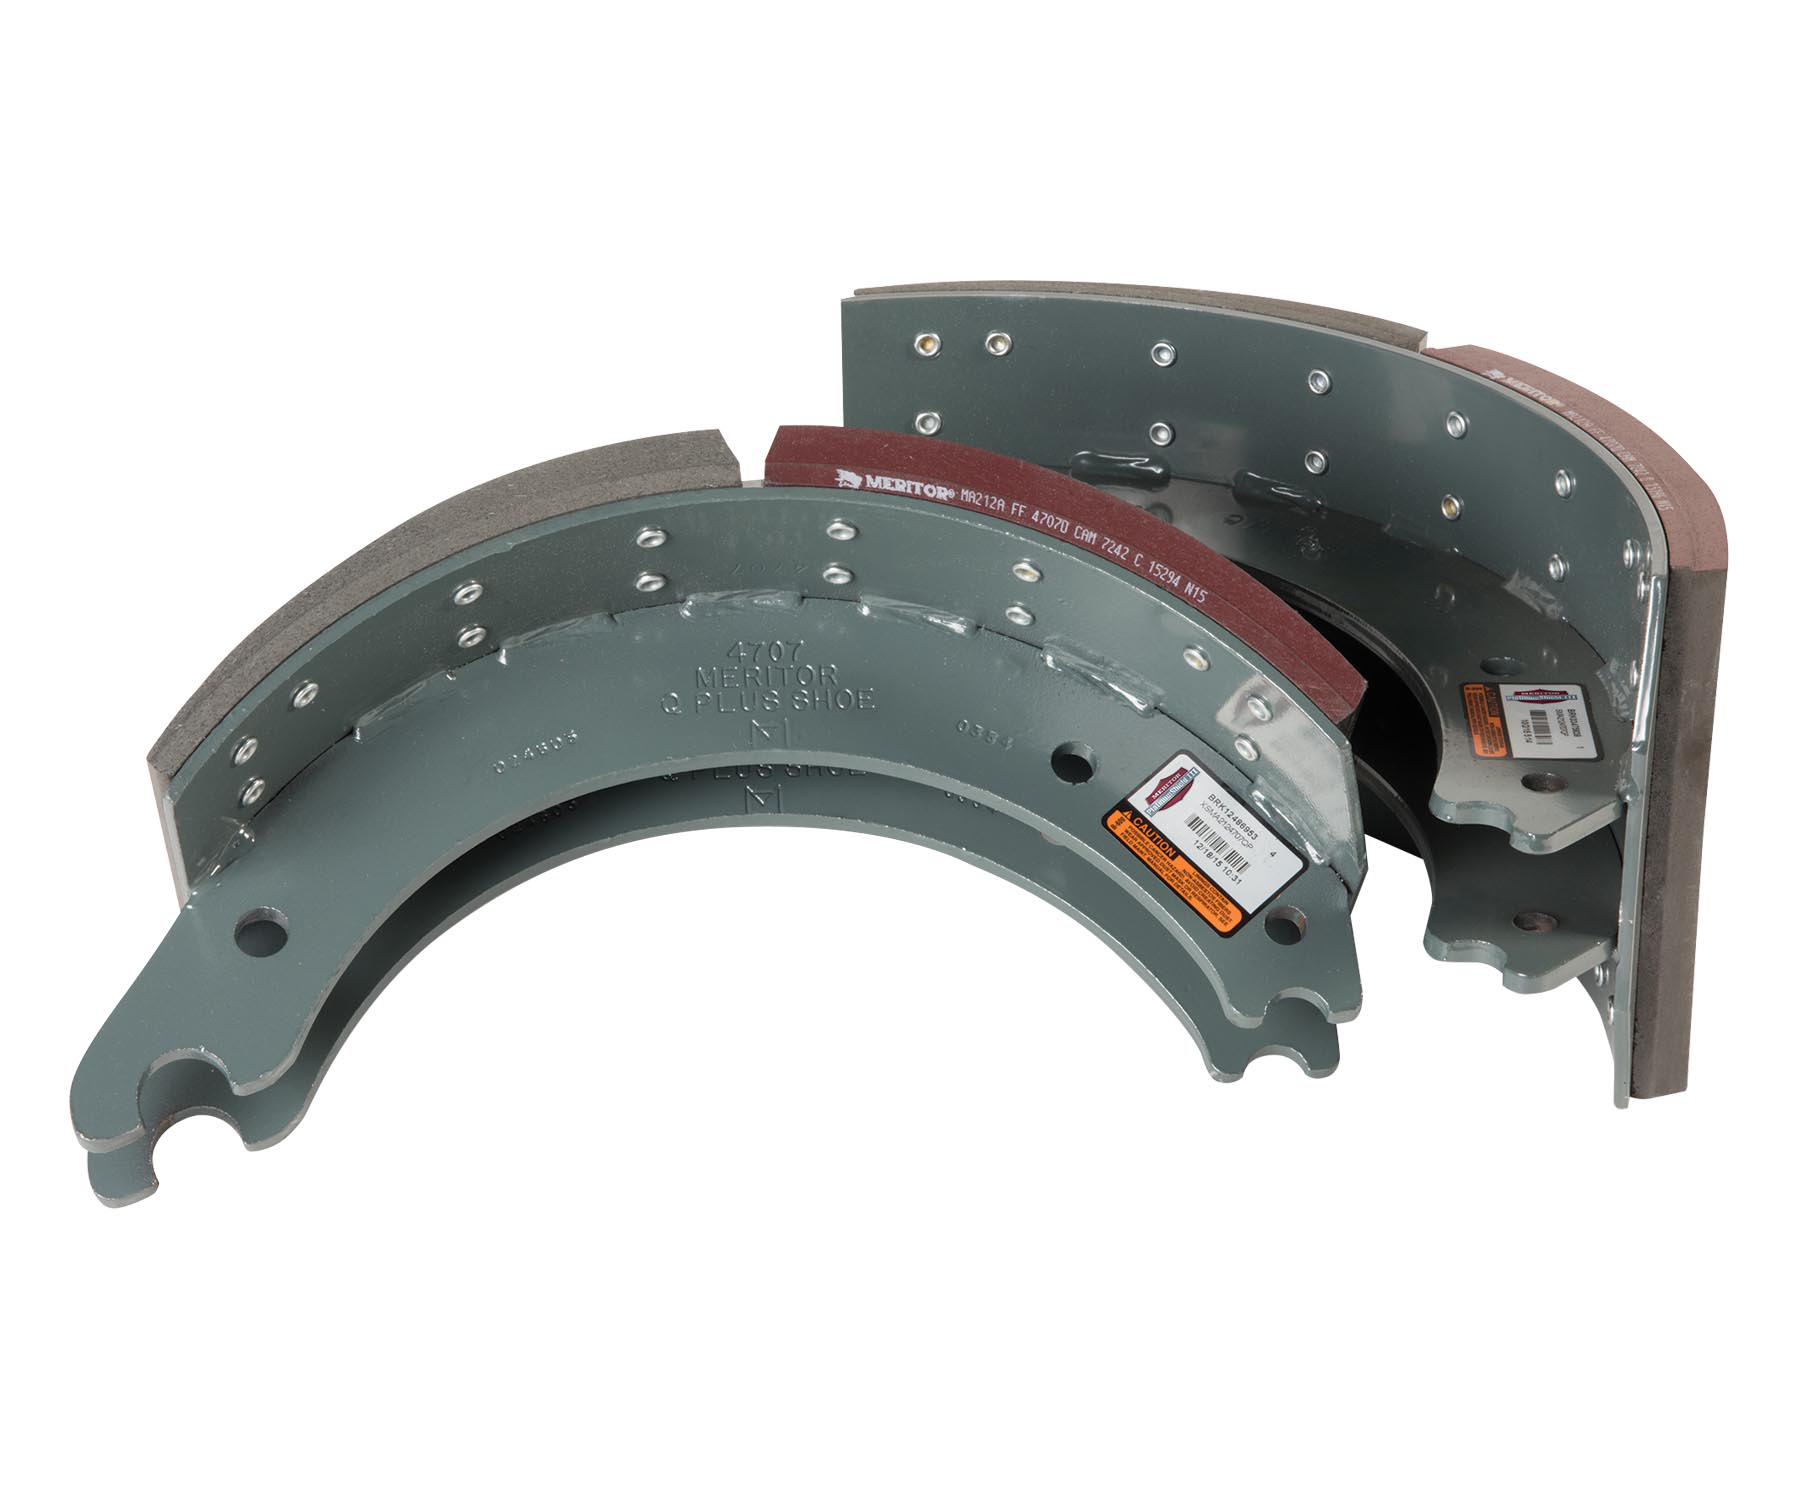 Meritor launches third PlatinumShield brake shoe coating